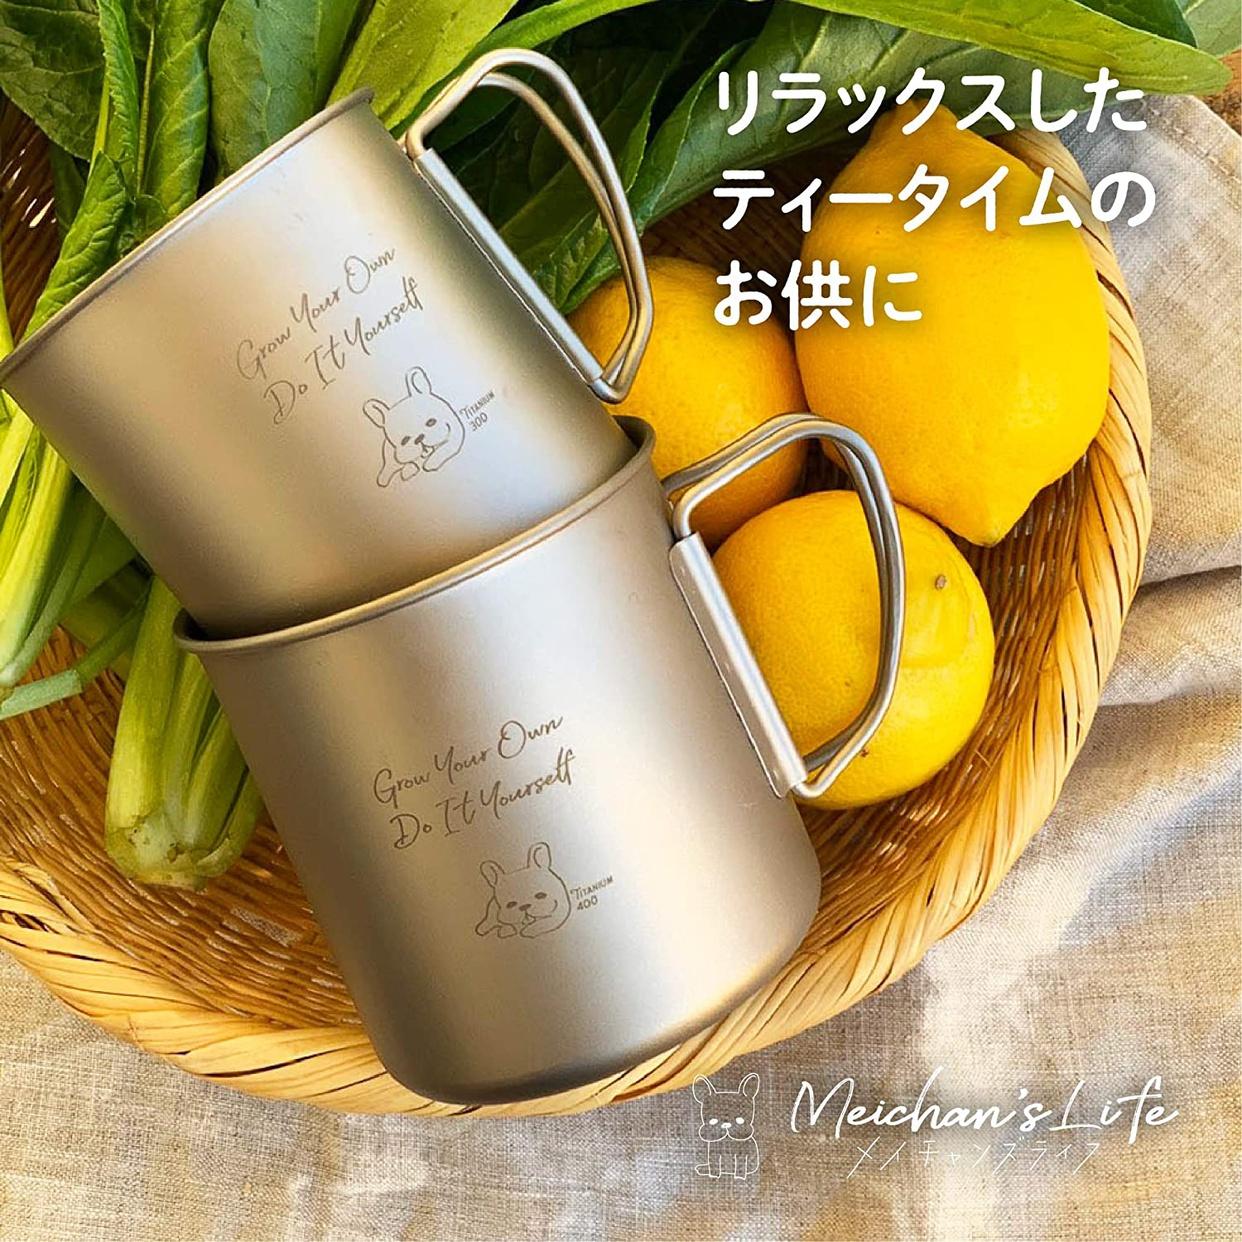 Meichan's Life(メイチャンズライフ) チタンマグの商品画像7